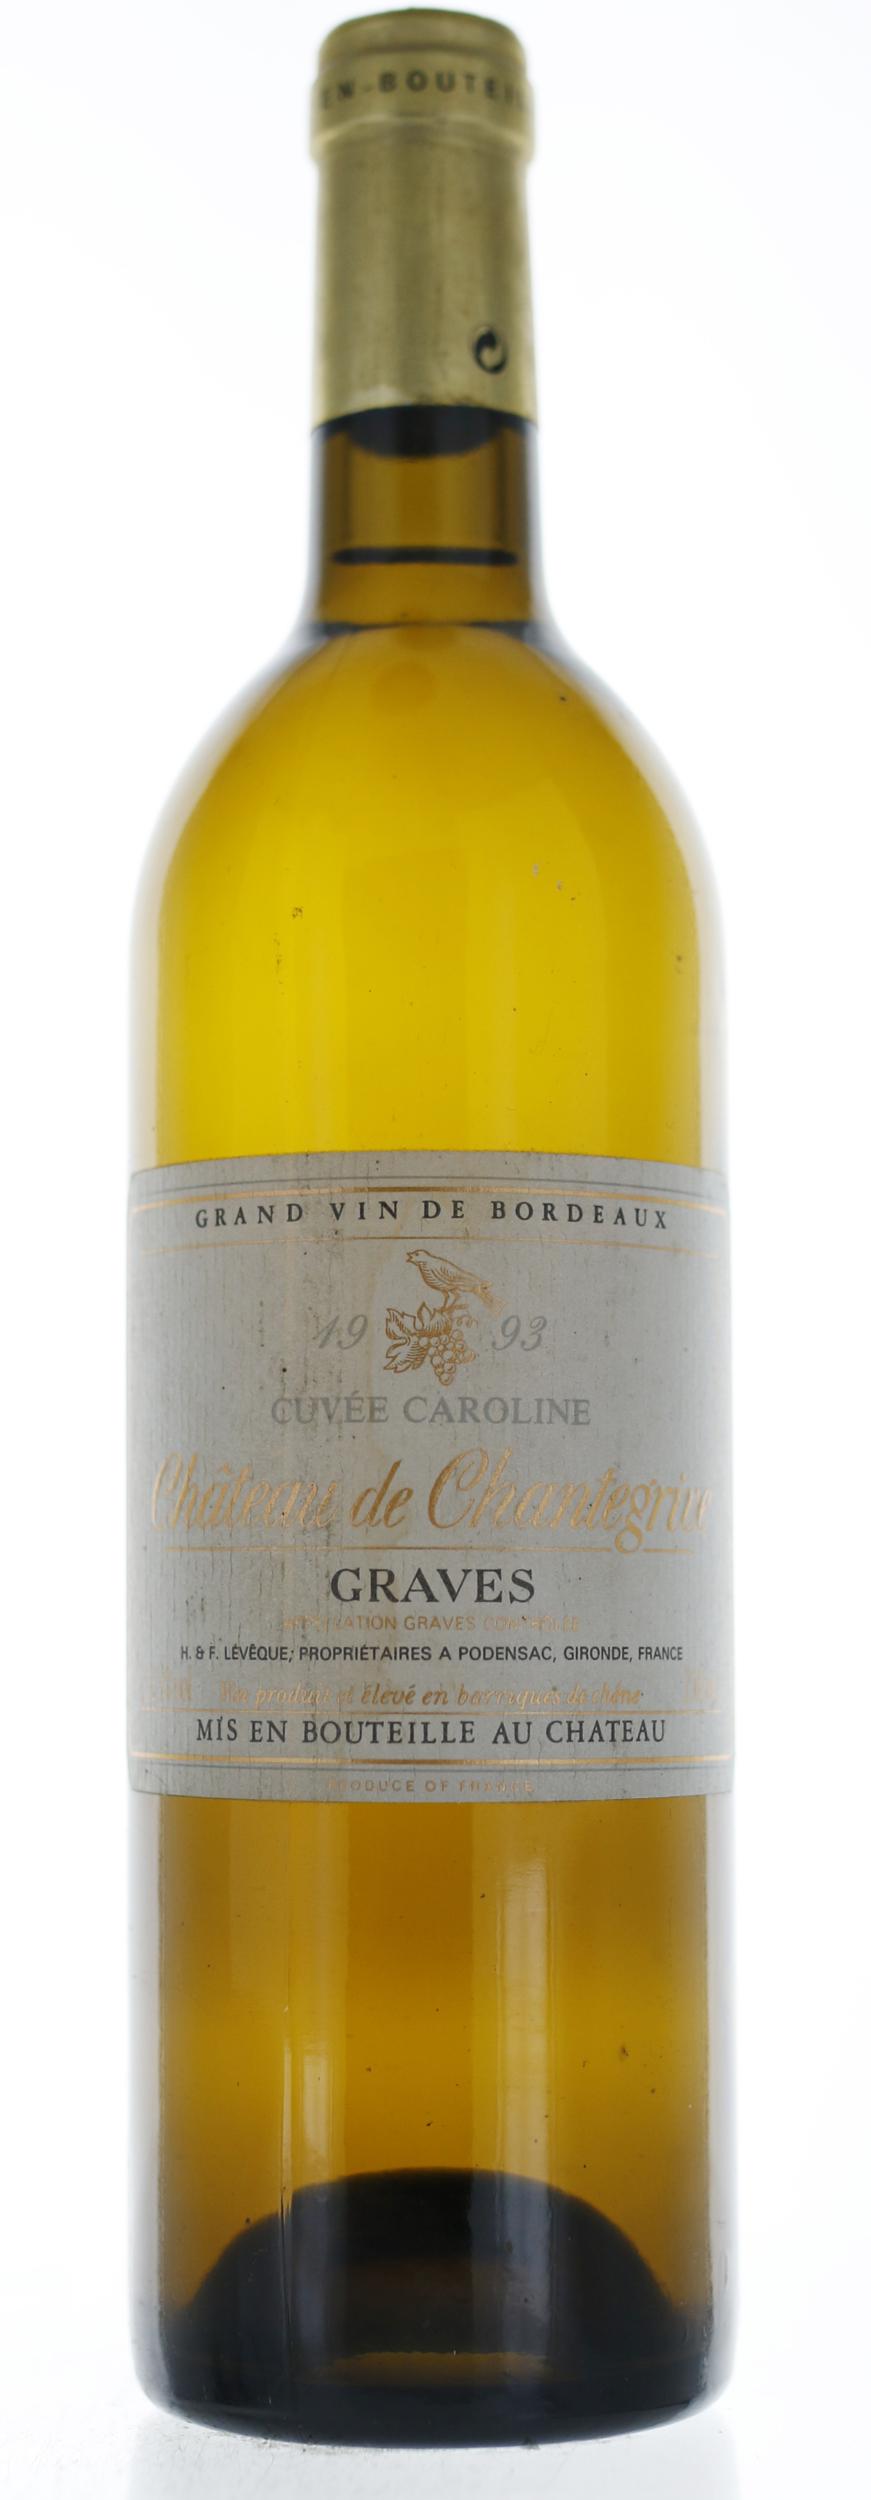 Graves Pessac Leognan - Chantegrive Cuvee Caroline  - 1993